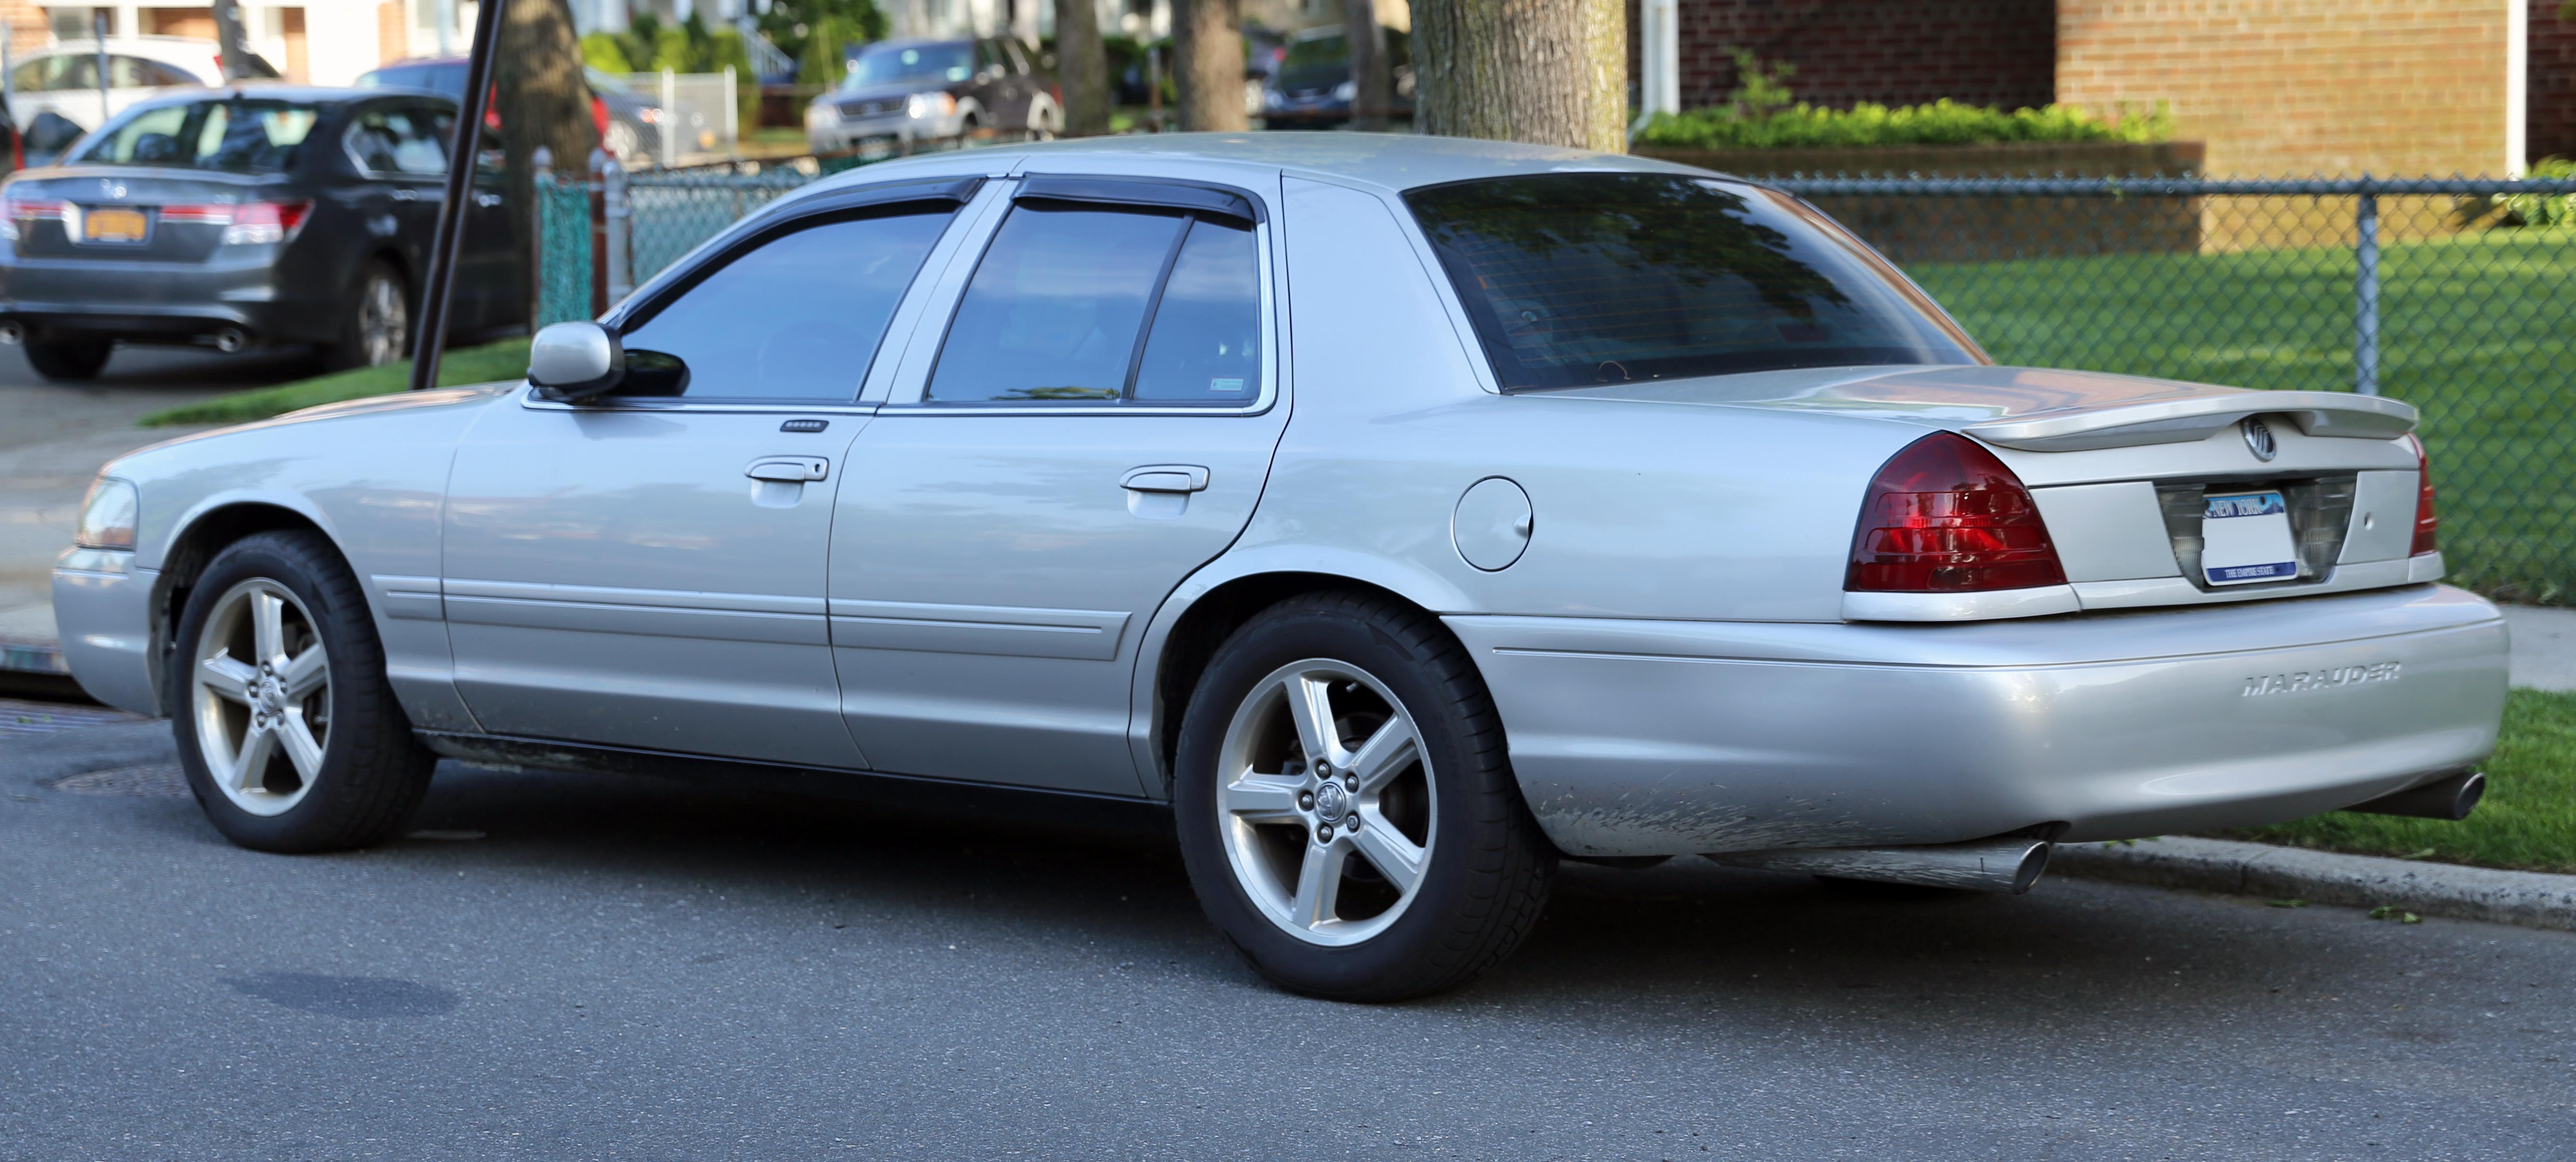 Mercury Marauder 2002 - 2004 Cabriolet #2